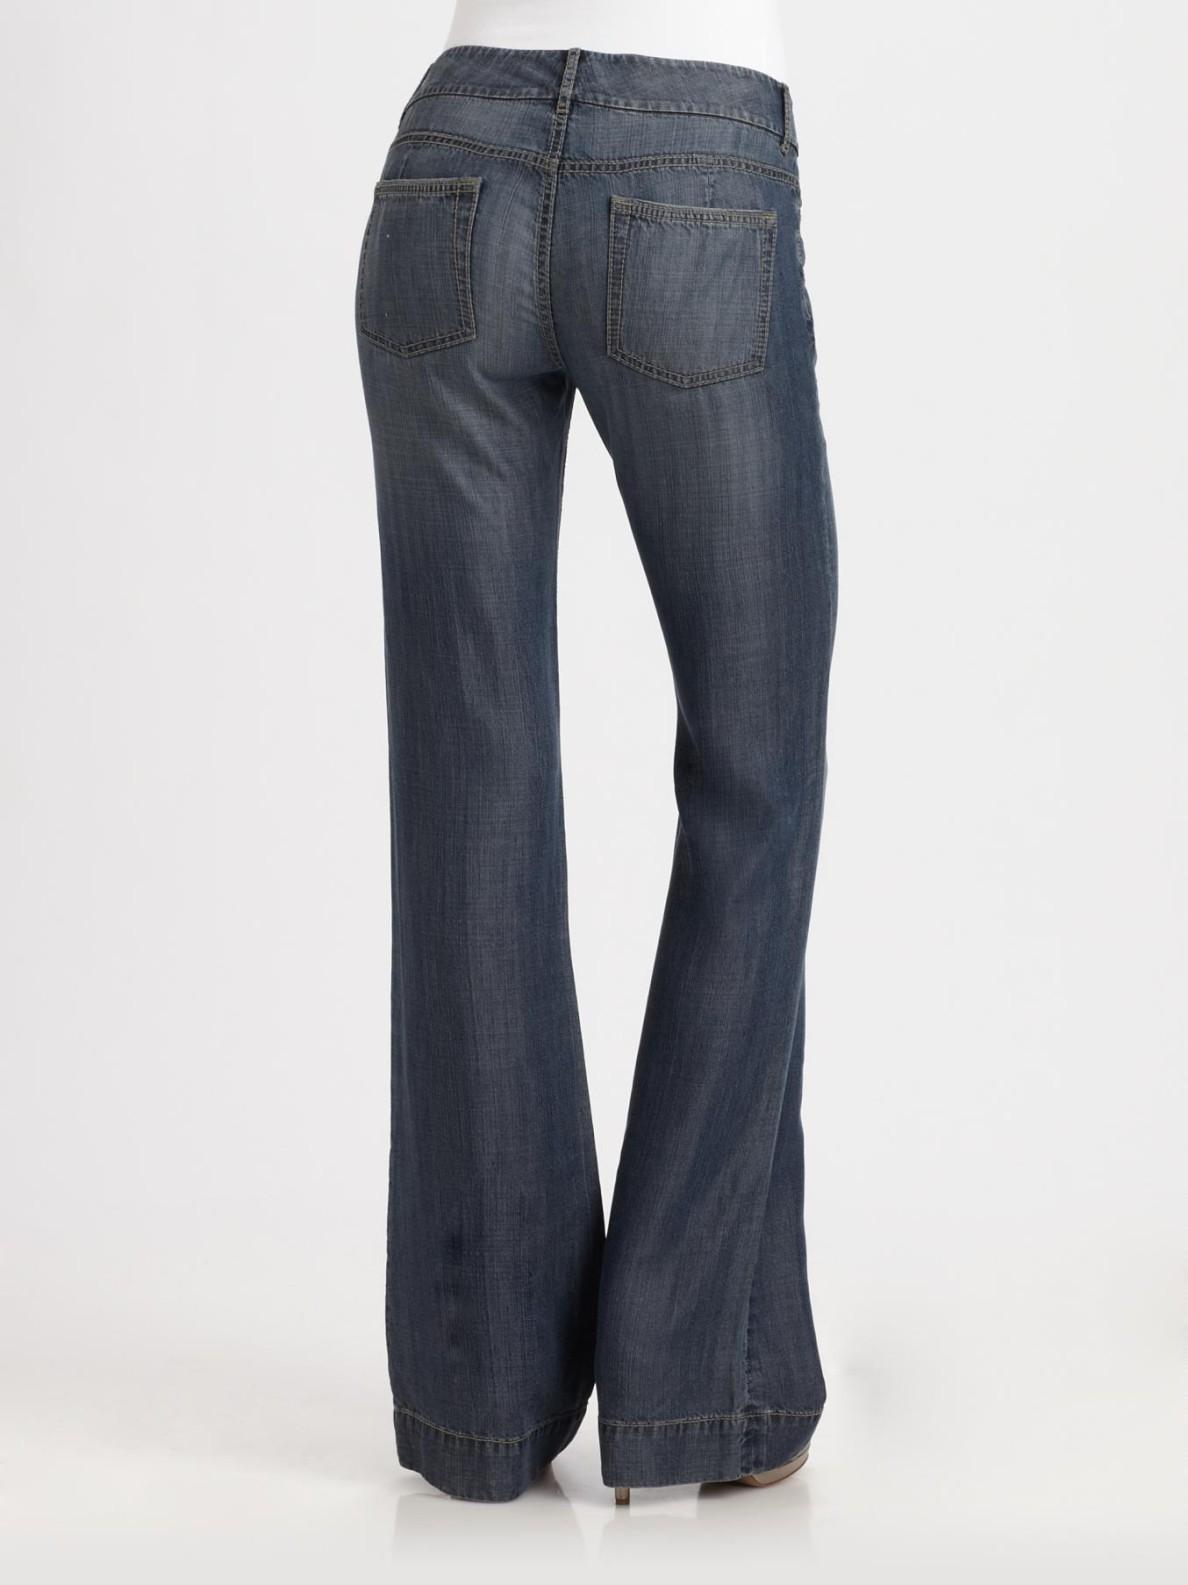 Cheap Sale Discounts DENIM - Denim trousers Elie Tahari Comfortable Online Clearance Many Kinds Of Offer Sale Nicekicks iWGlu8vK